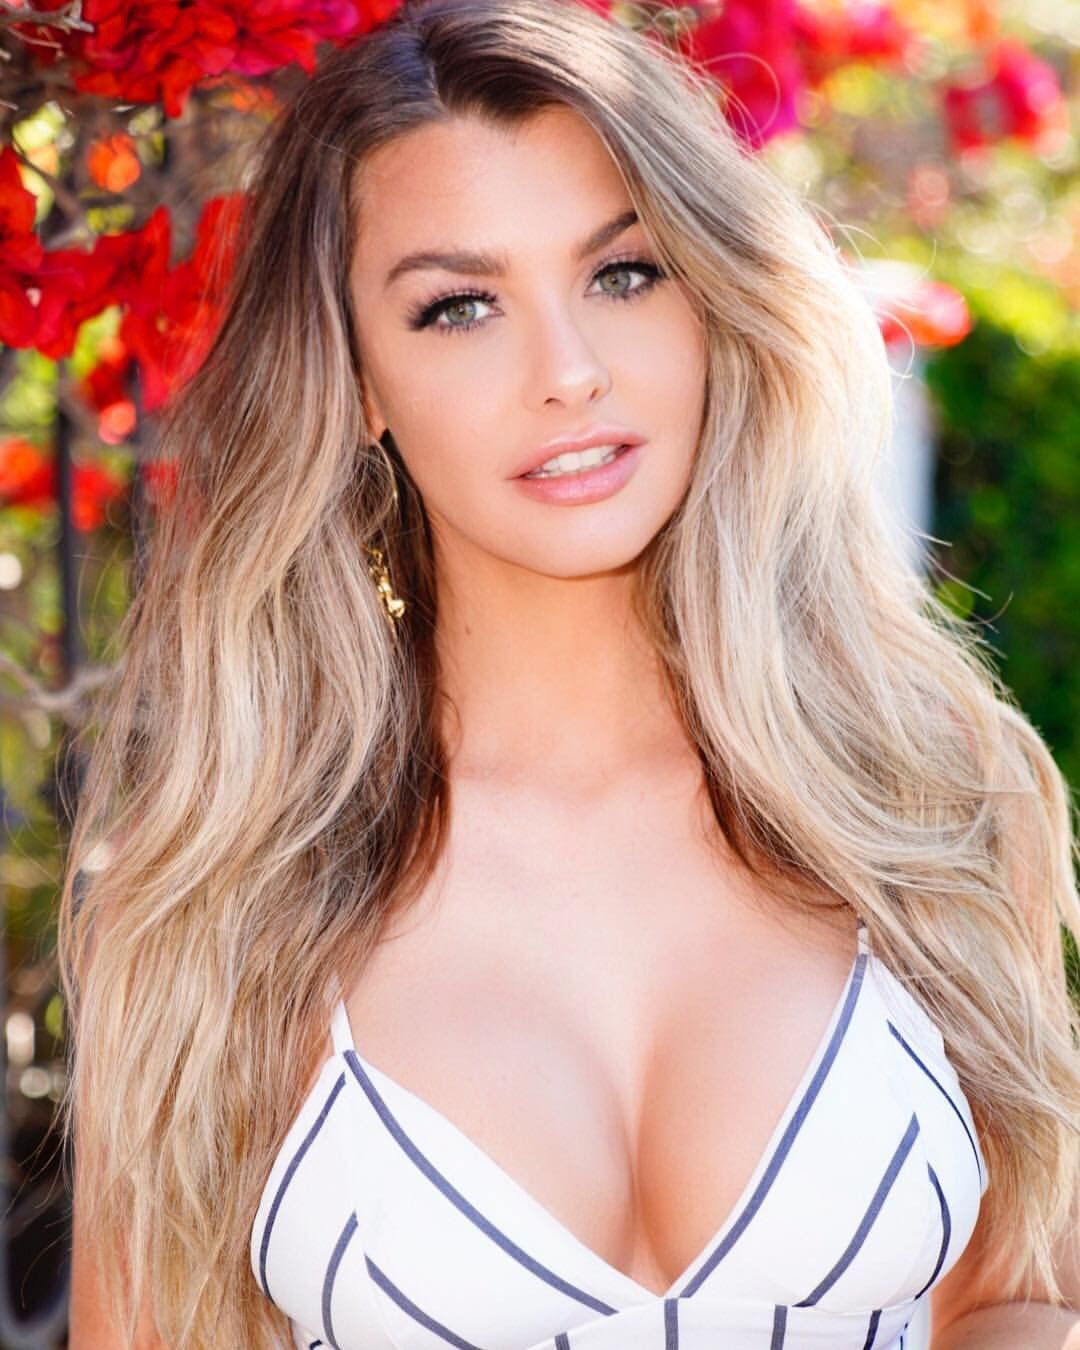 Boobs Giovanna Ewbank nude photos 2019